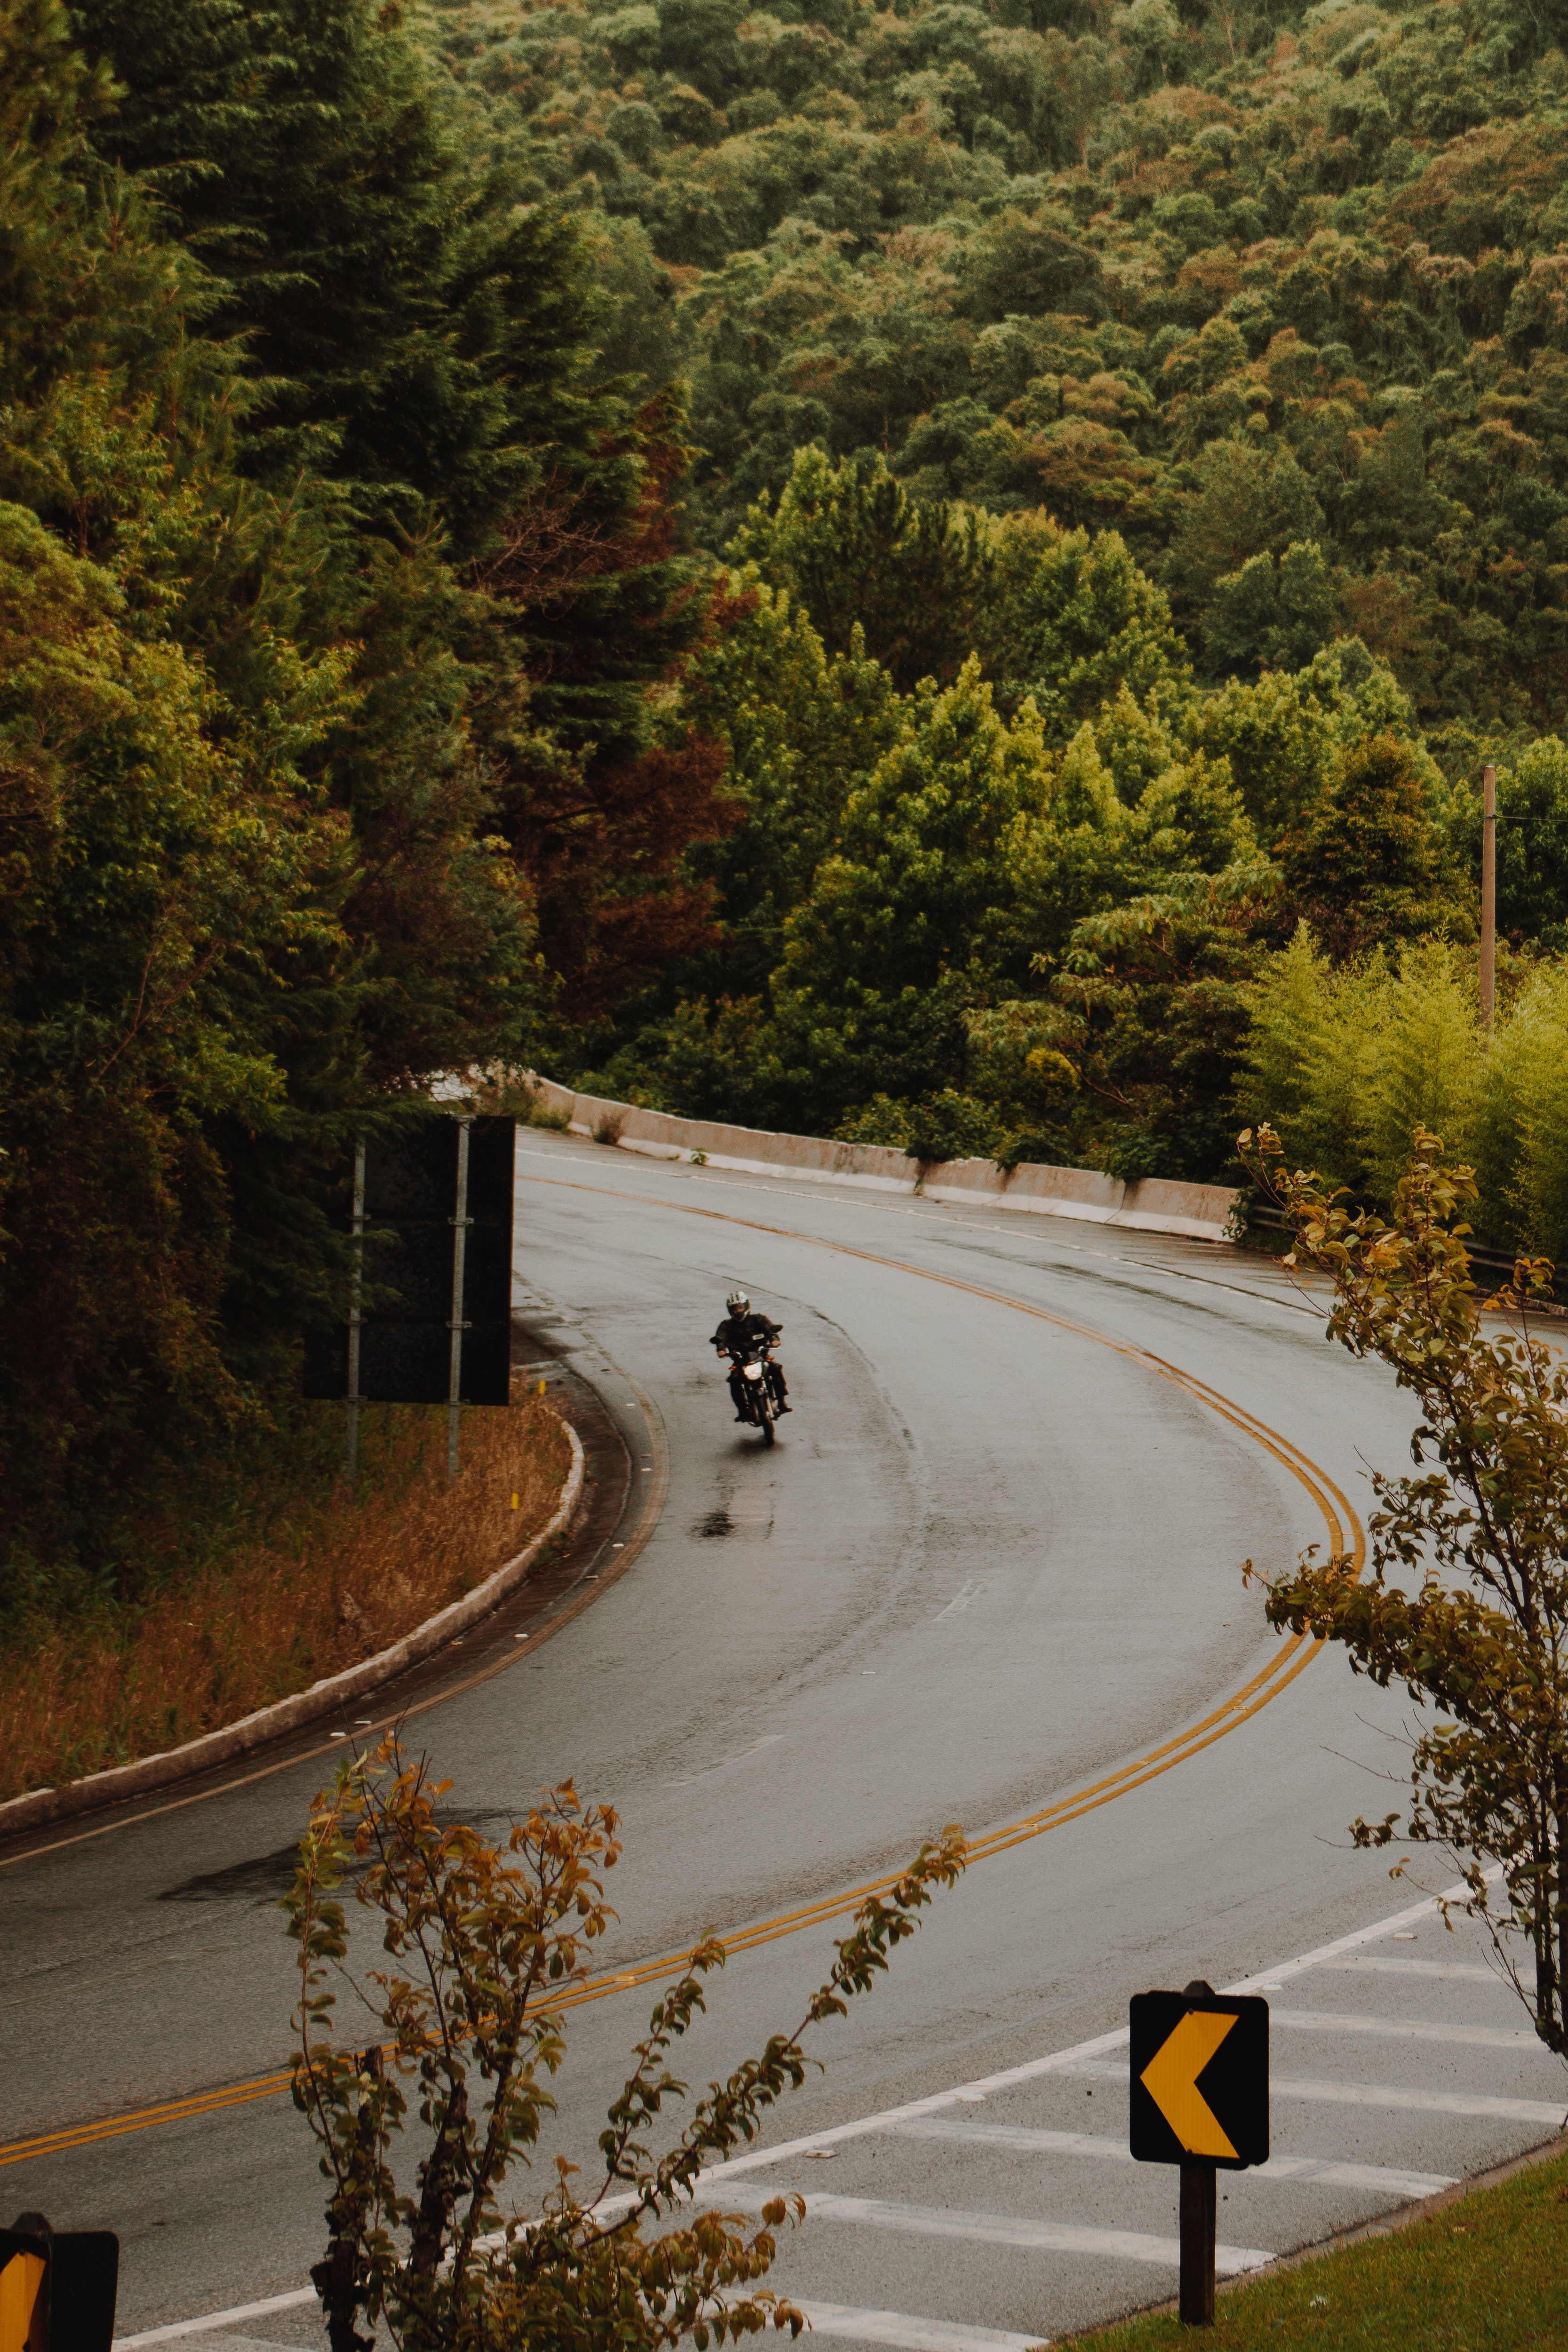 Man Riding Motorcycle on Road, Asphalt, Nature, Vehicle, Trees, HQ Photo